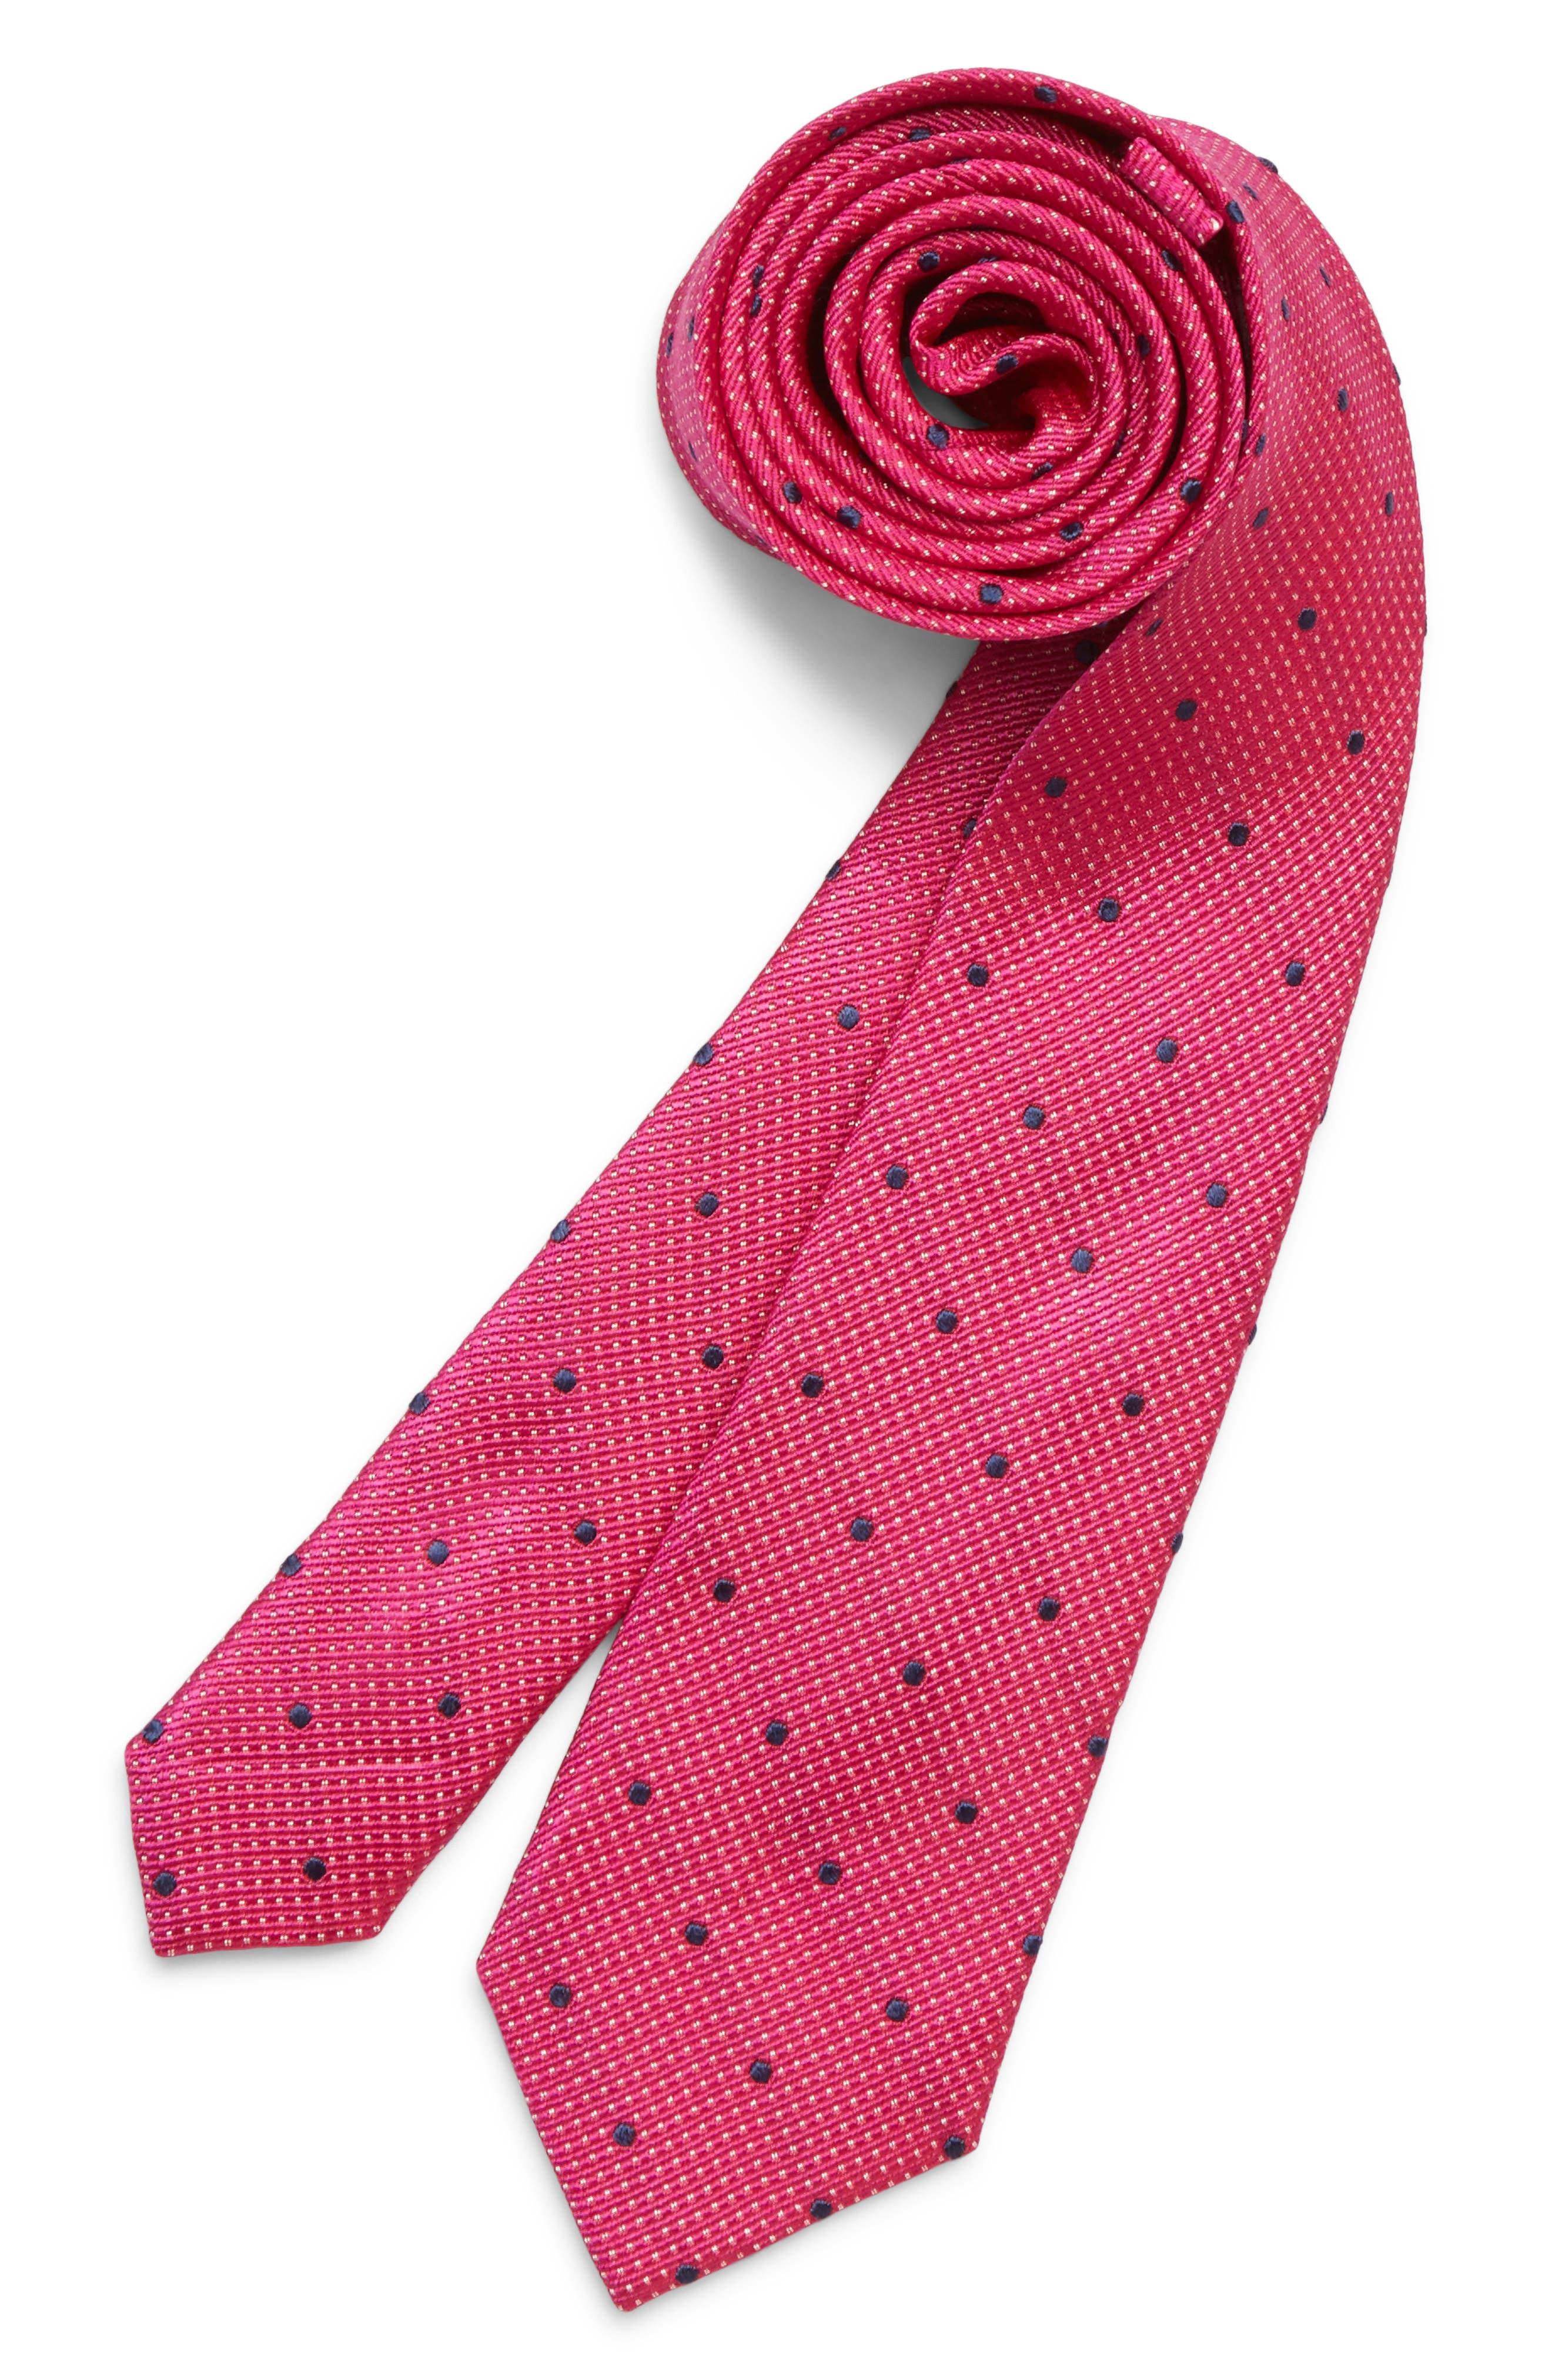 MICHAEL KORS Dot Silk Tie, Main, color, FUCHSIA